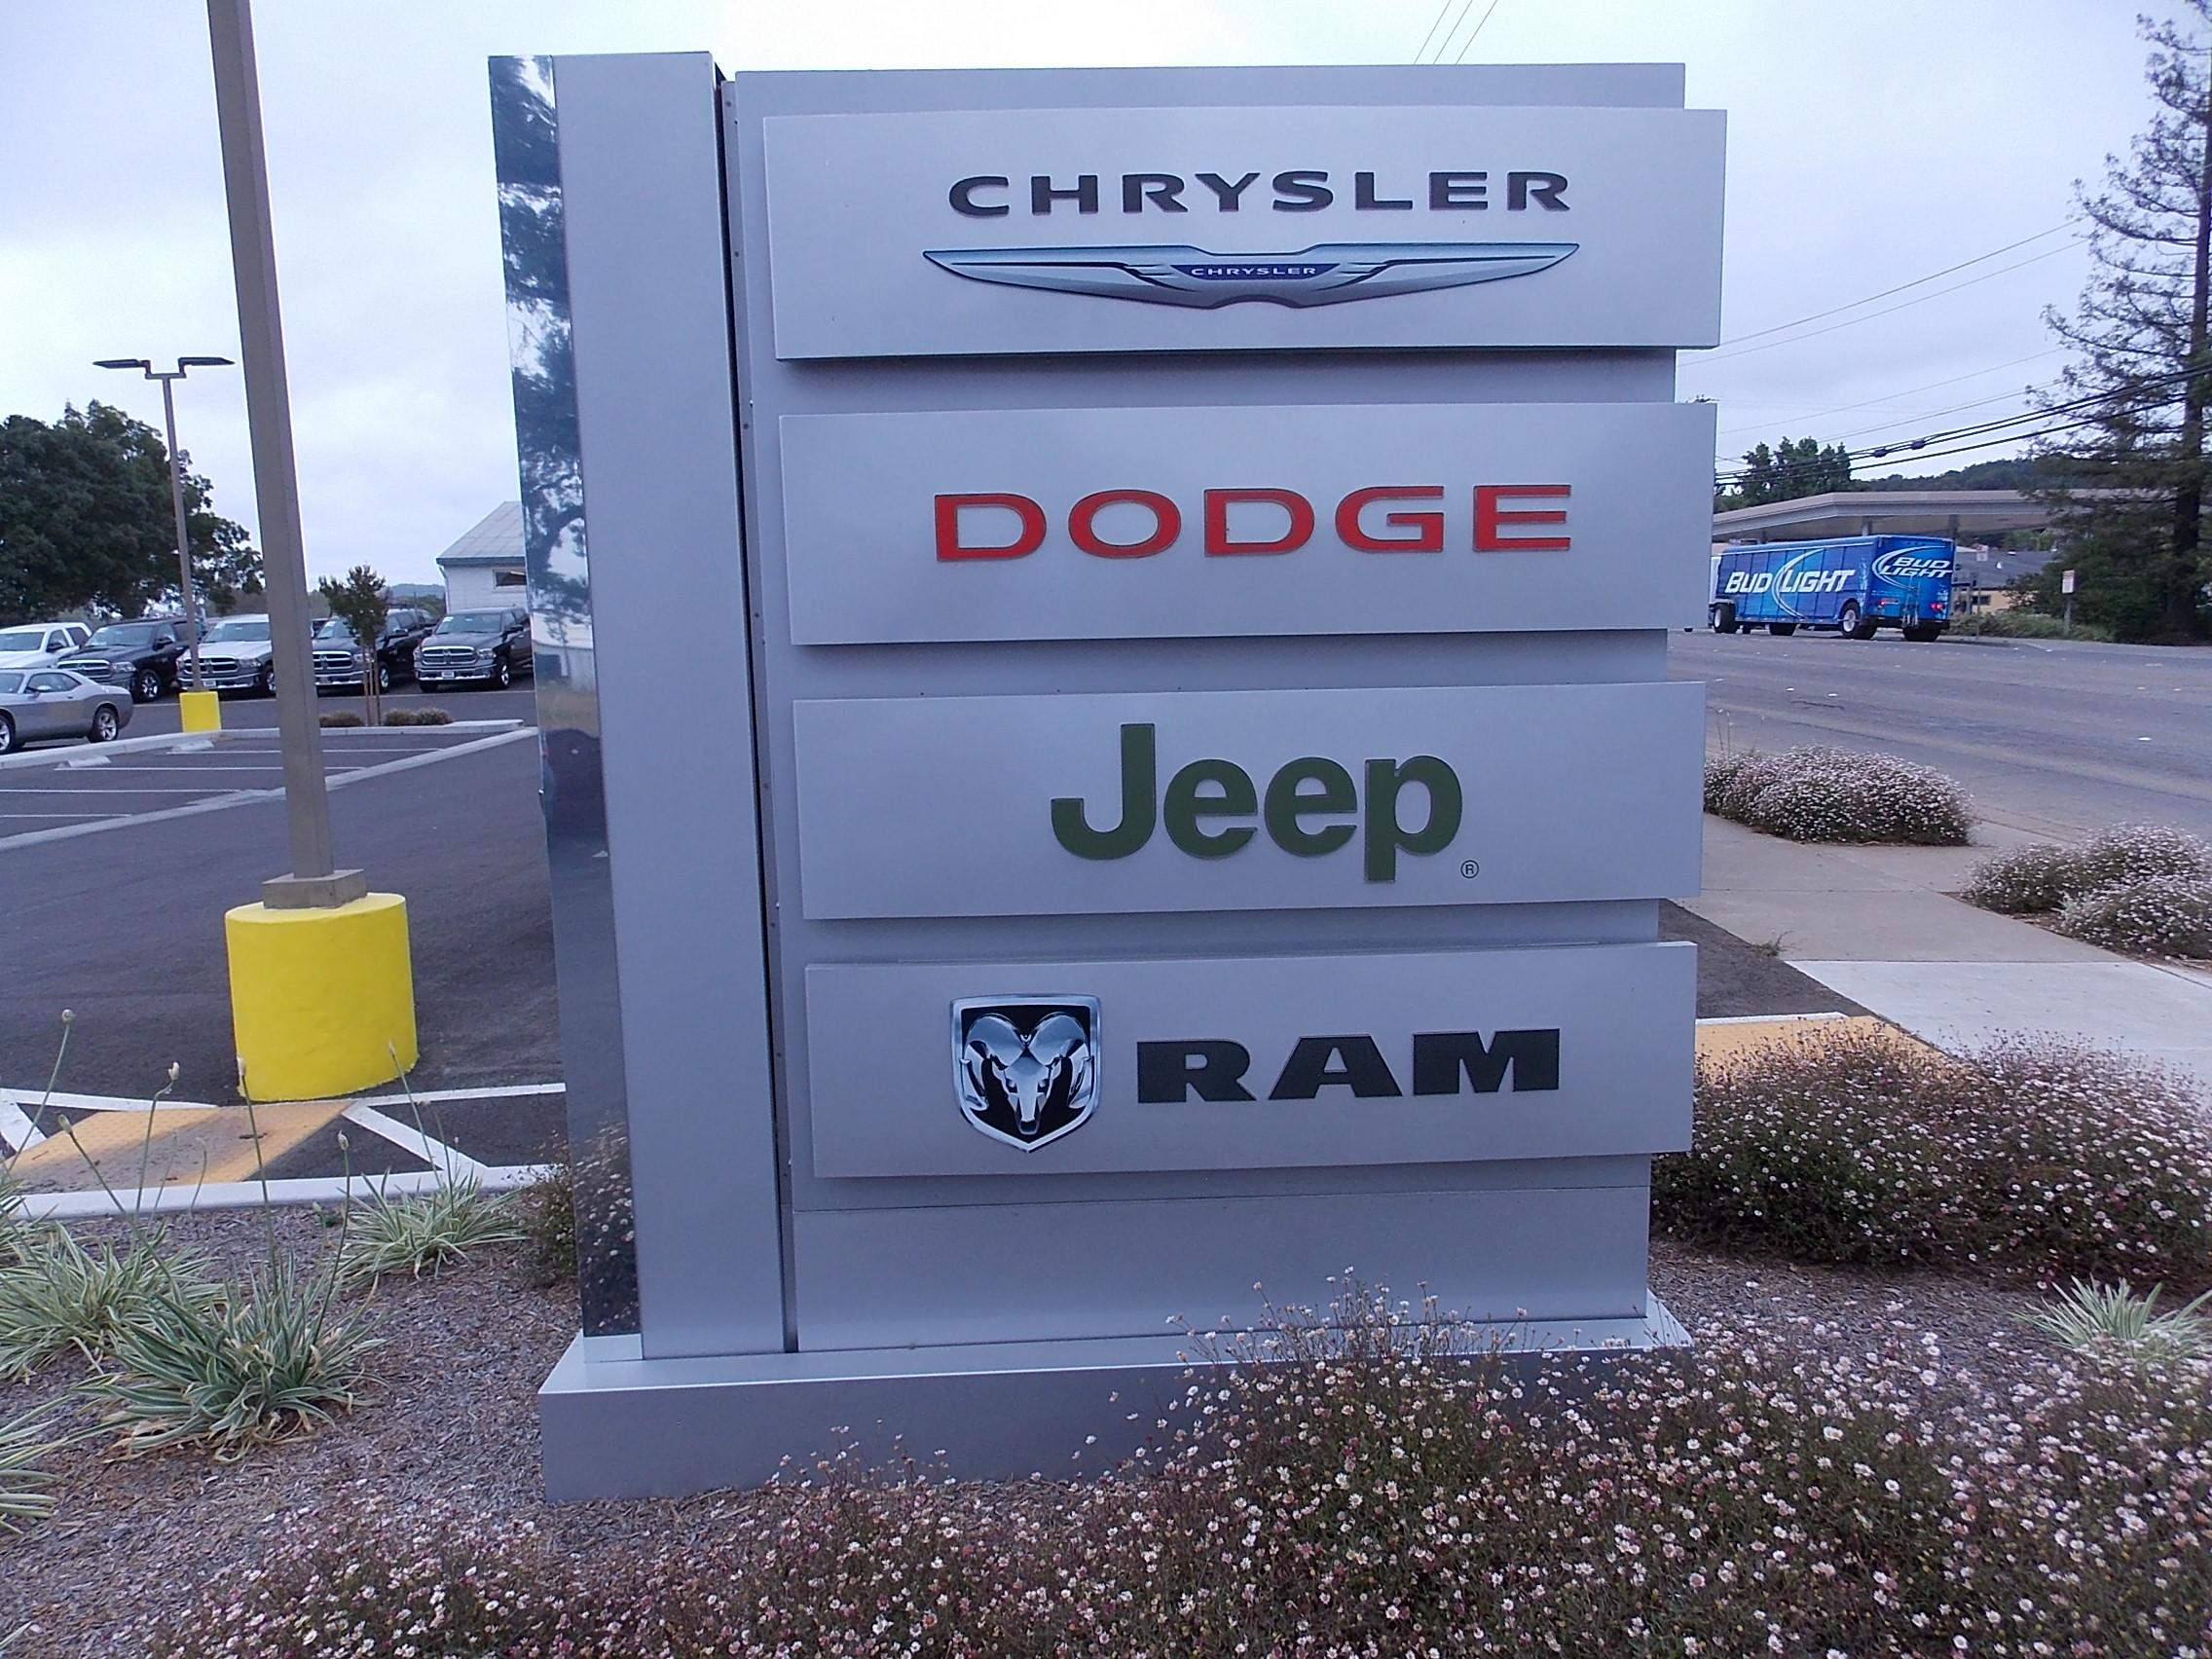 McConnell Chrysler Dodge Jeep Ram image 3